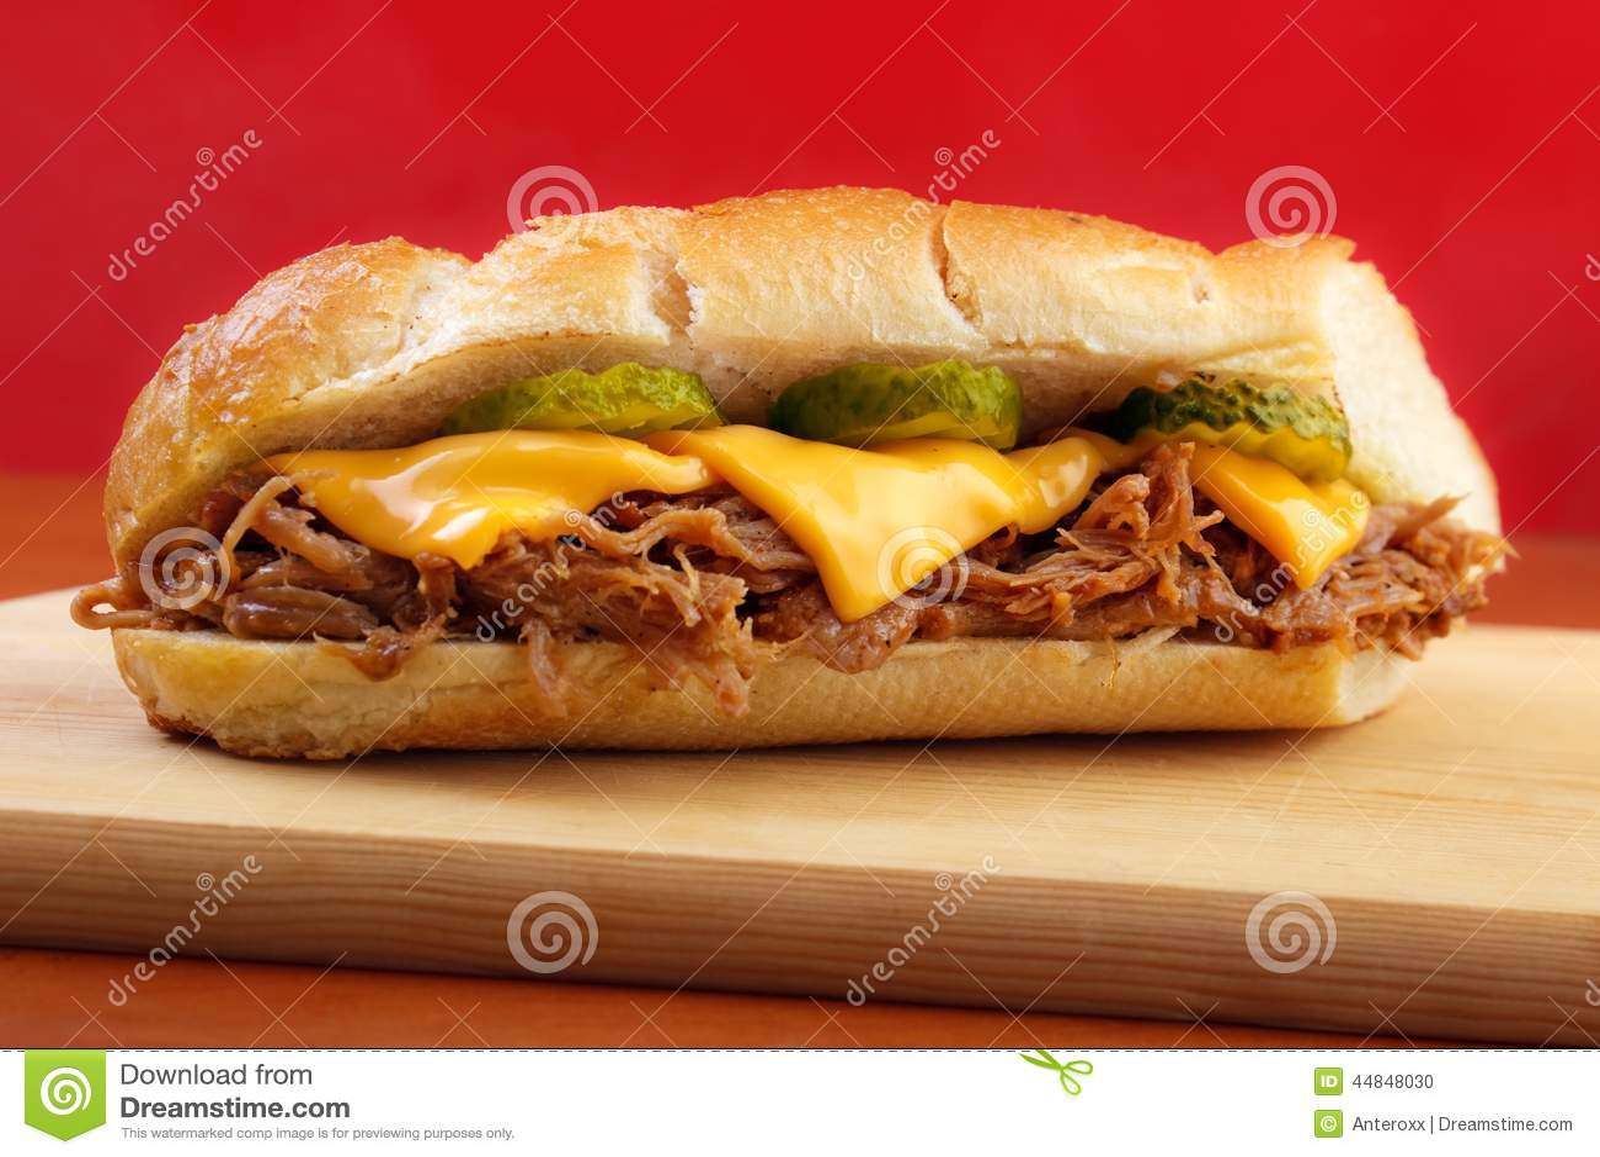 Fast Food Bbq Pork Sandwich